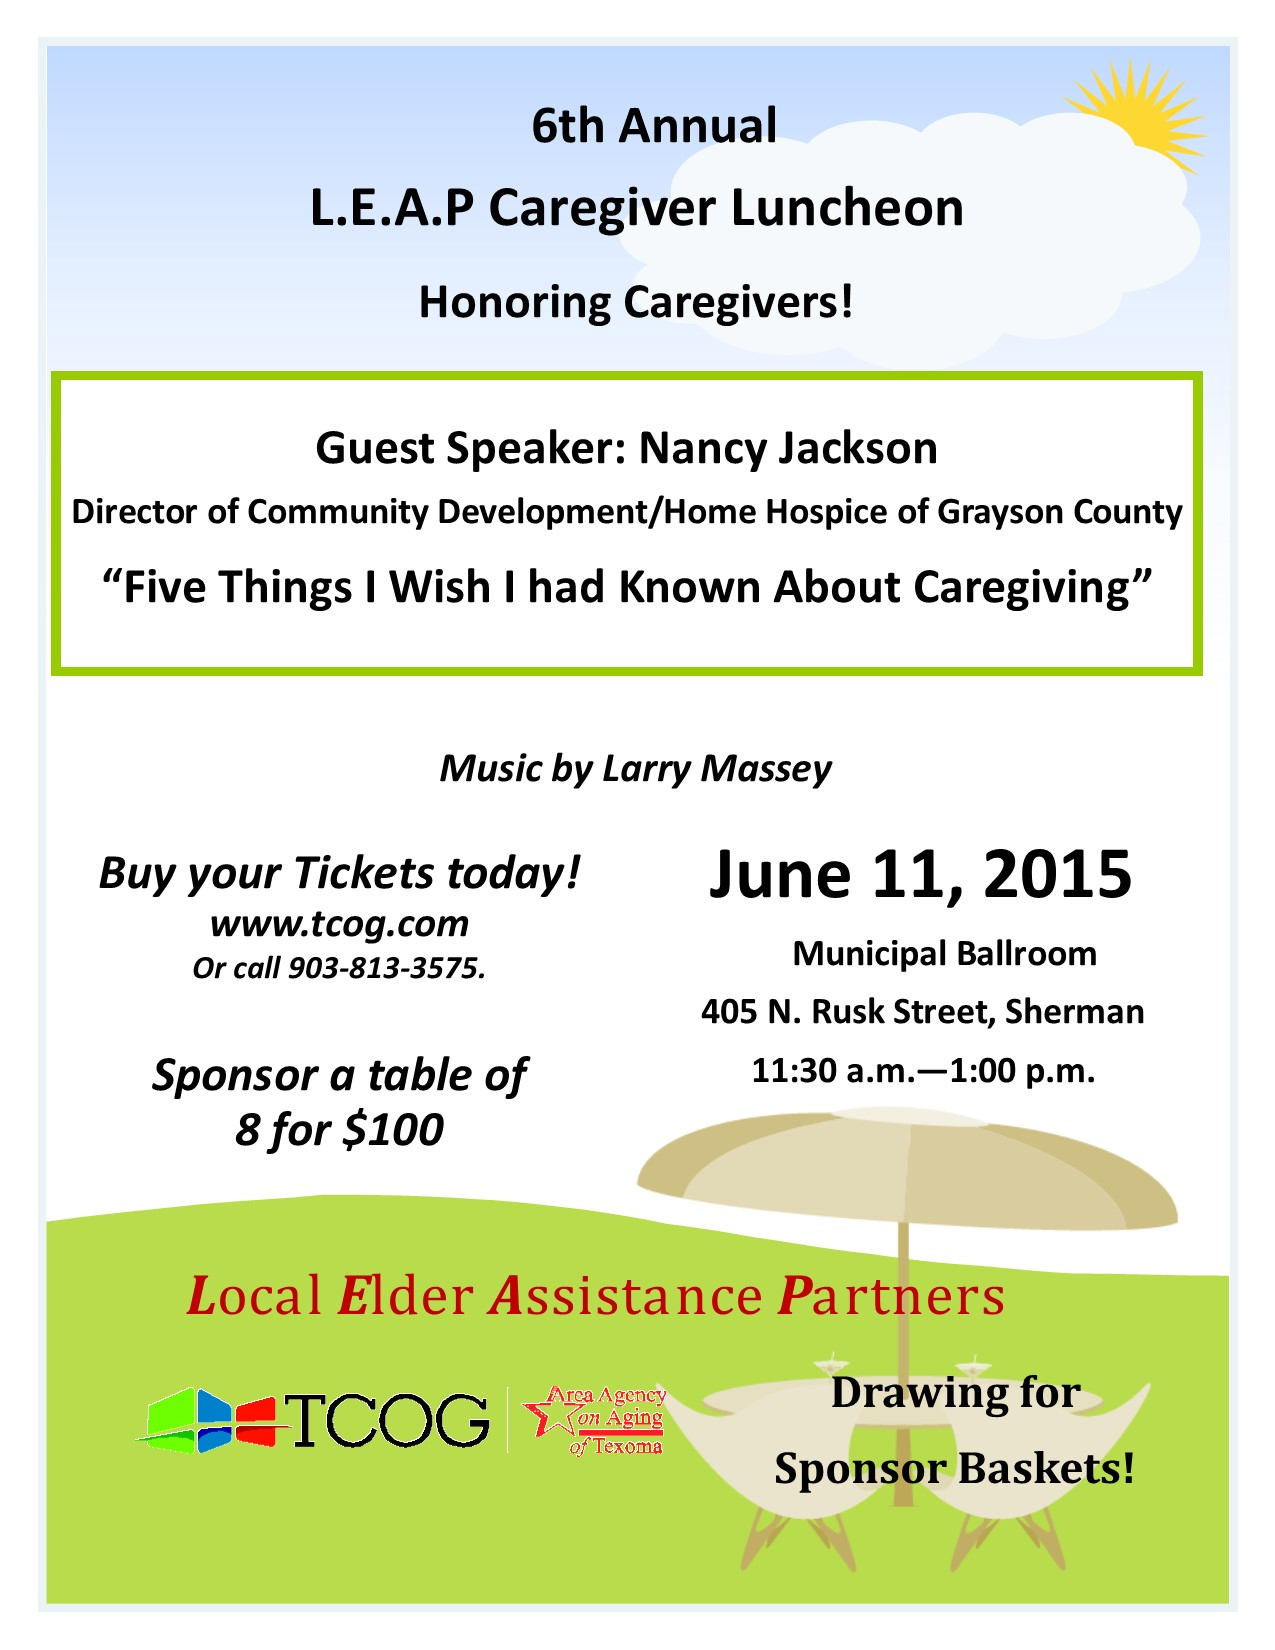 6th Annual LEAP Caregiver Luncheon